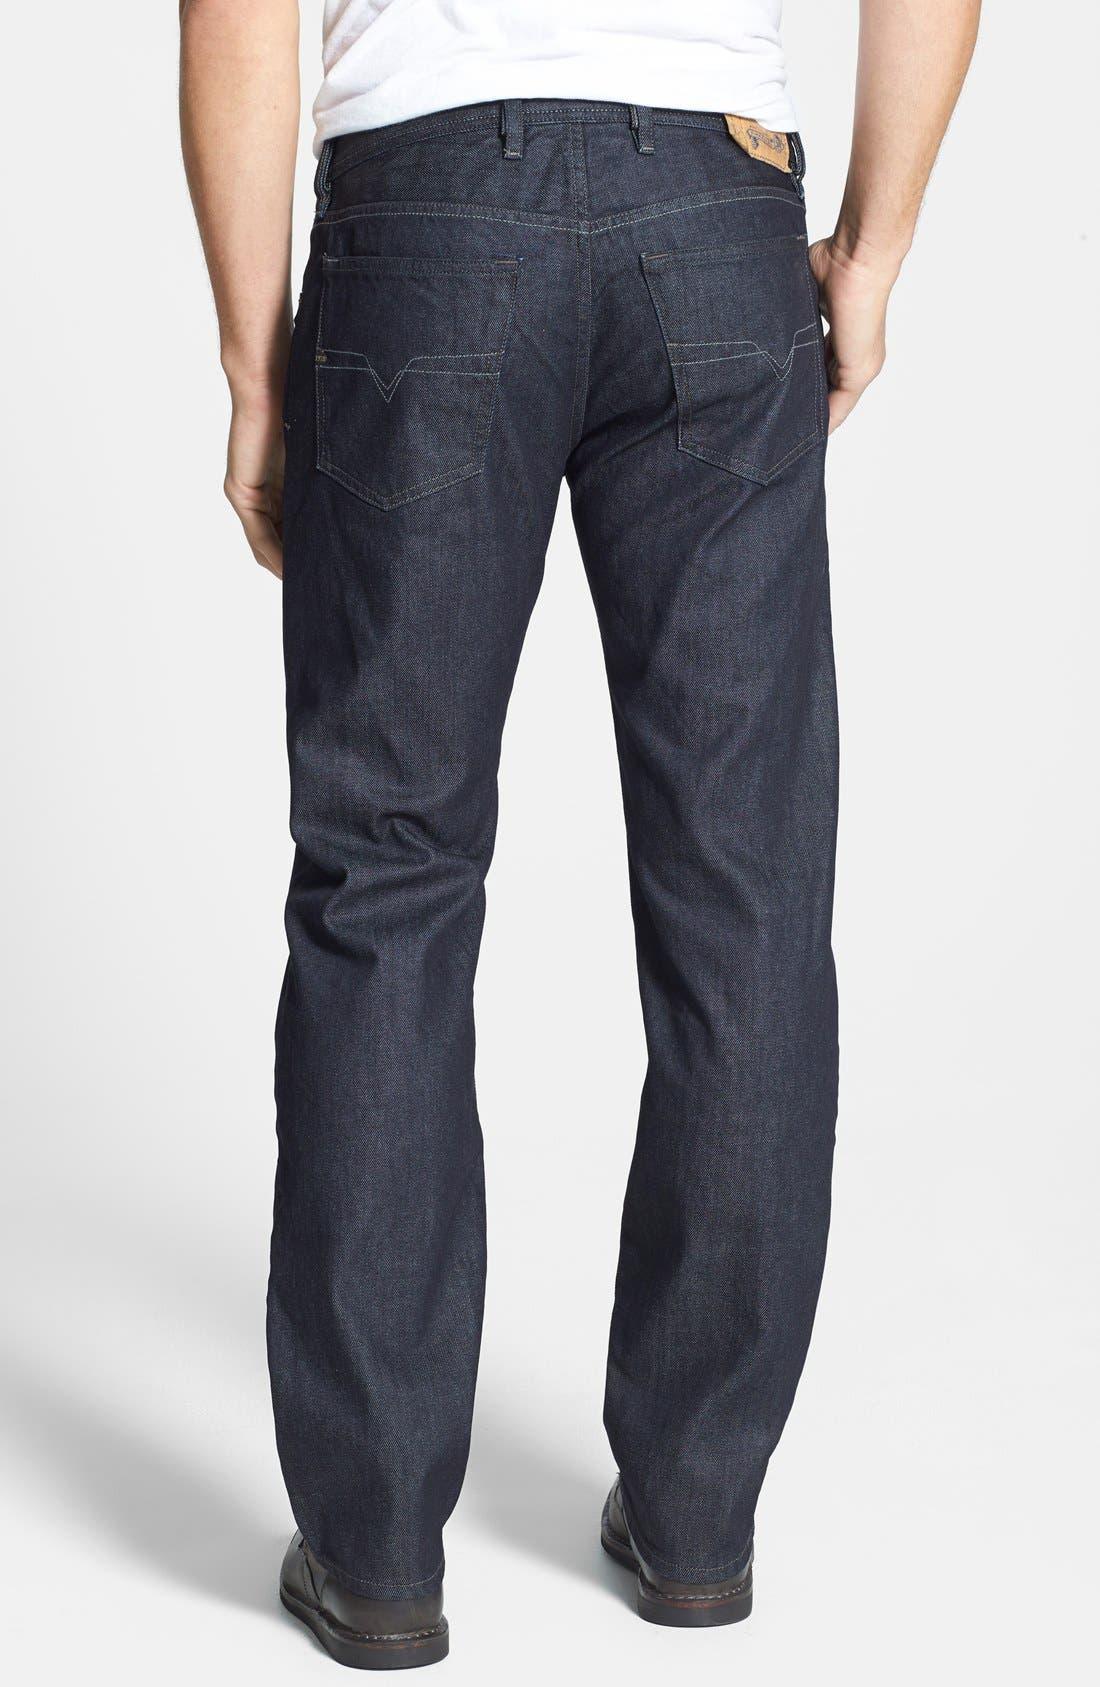 Waykee Straight Leg Jeans,                             Alternate thumbnail 2, color,                             0Z88